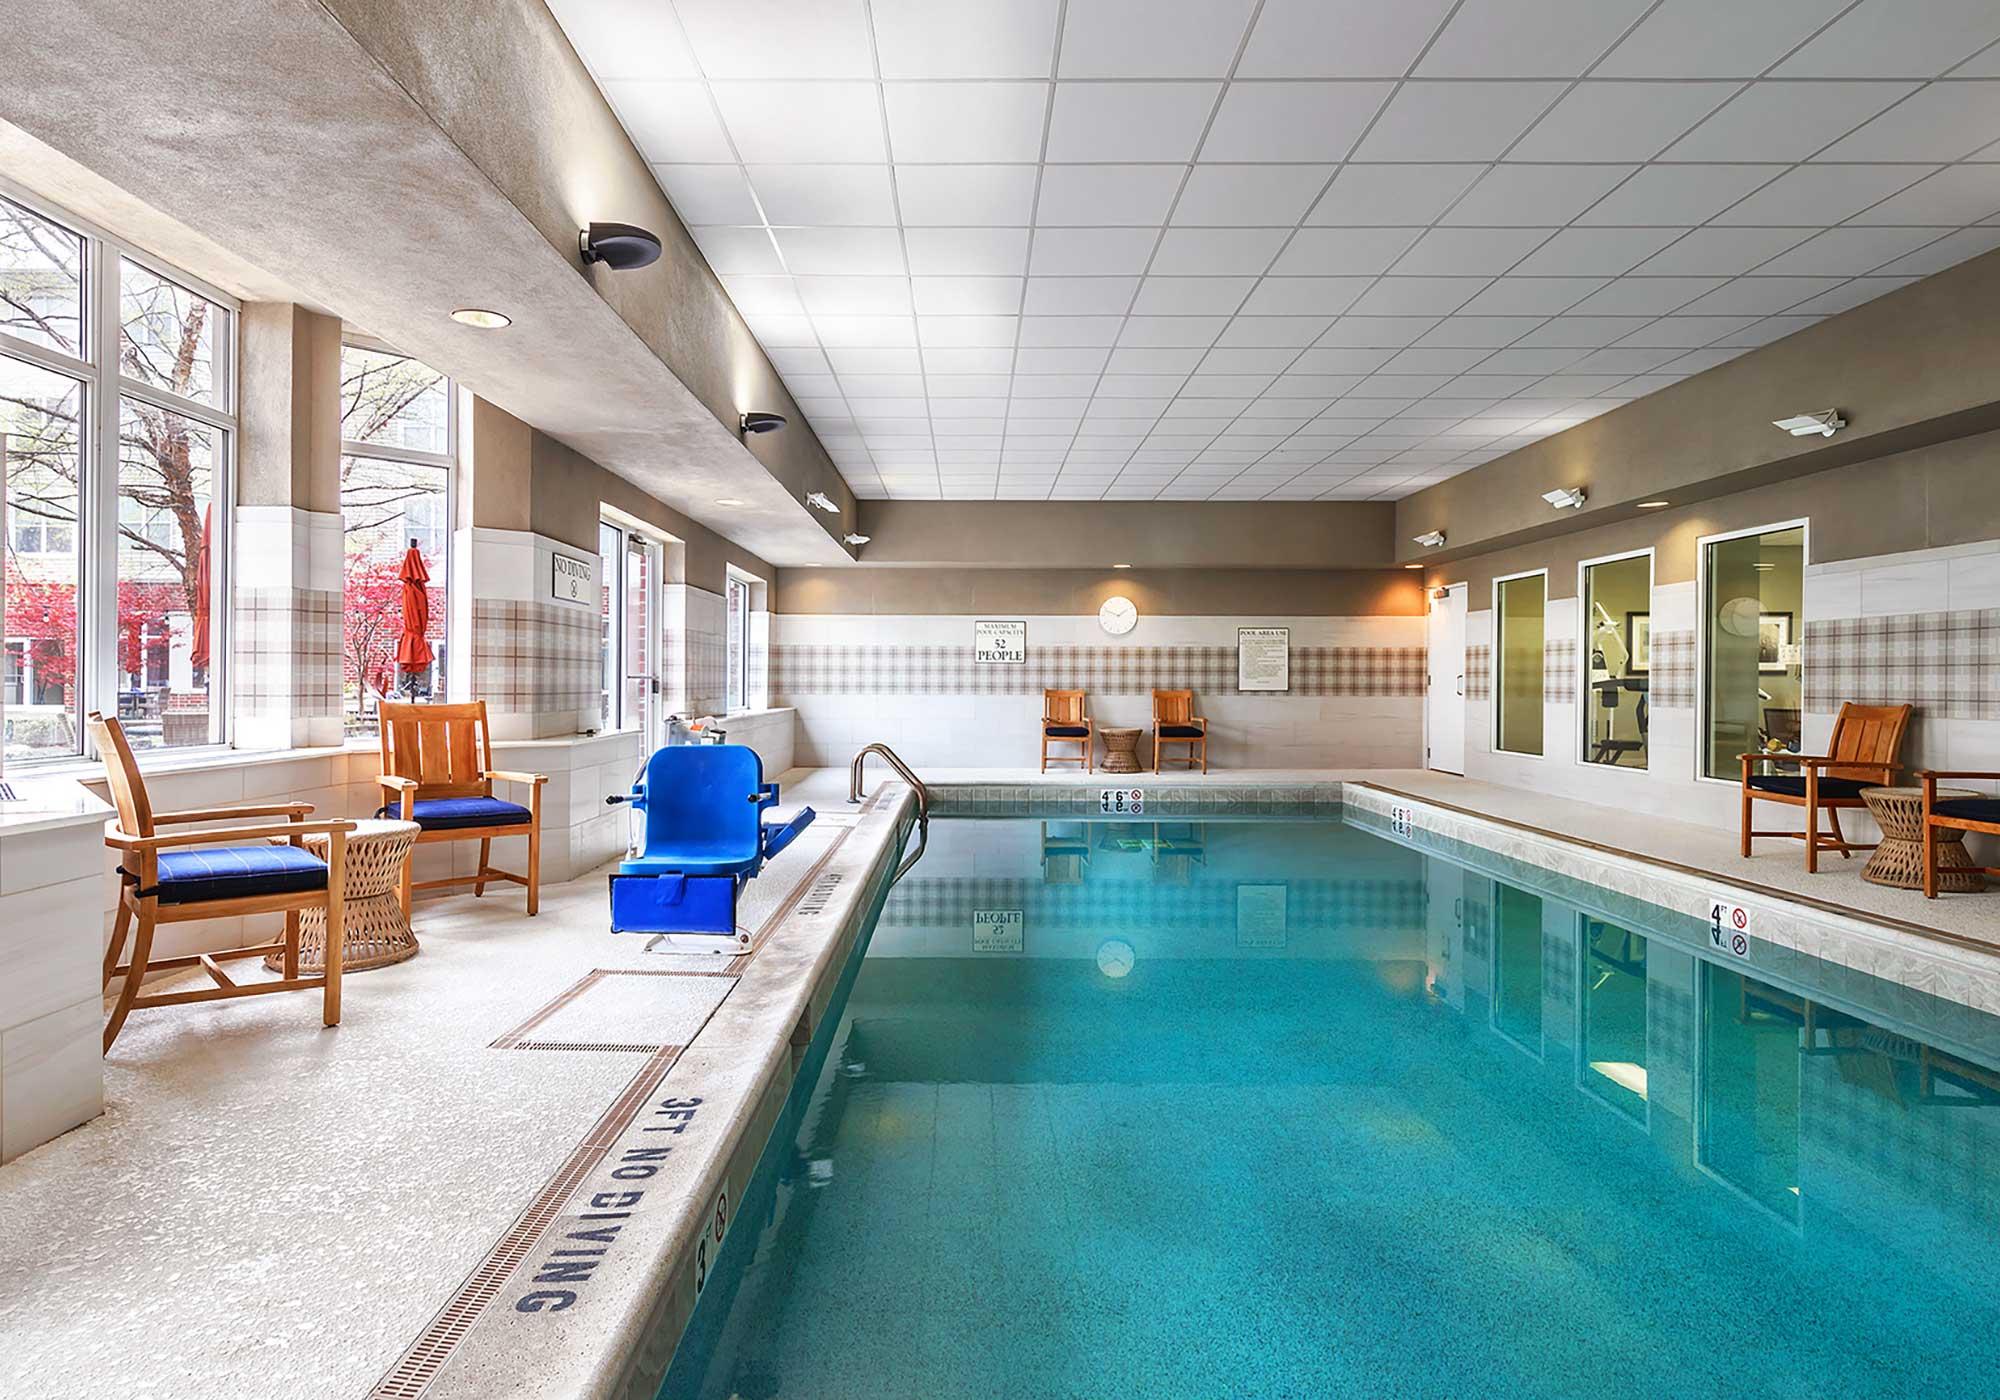 Rectangular swimming pools